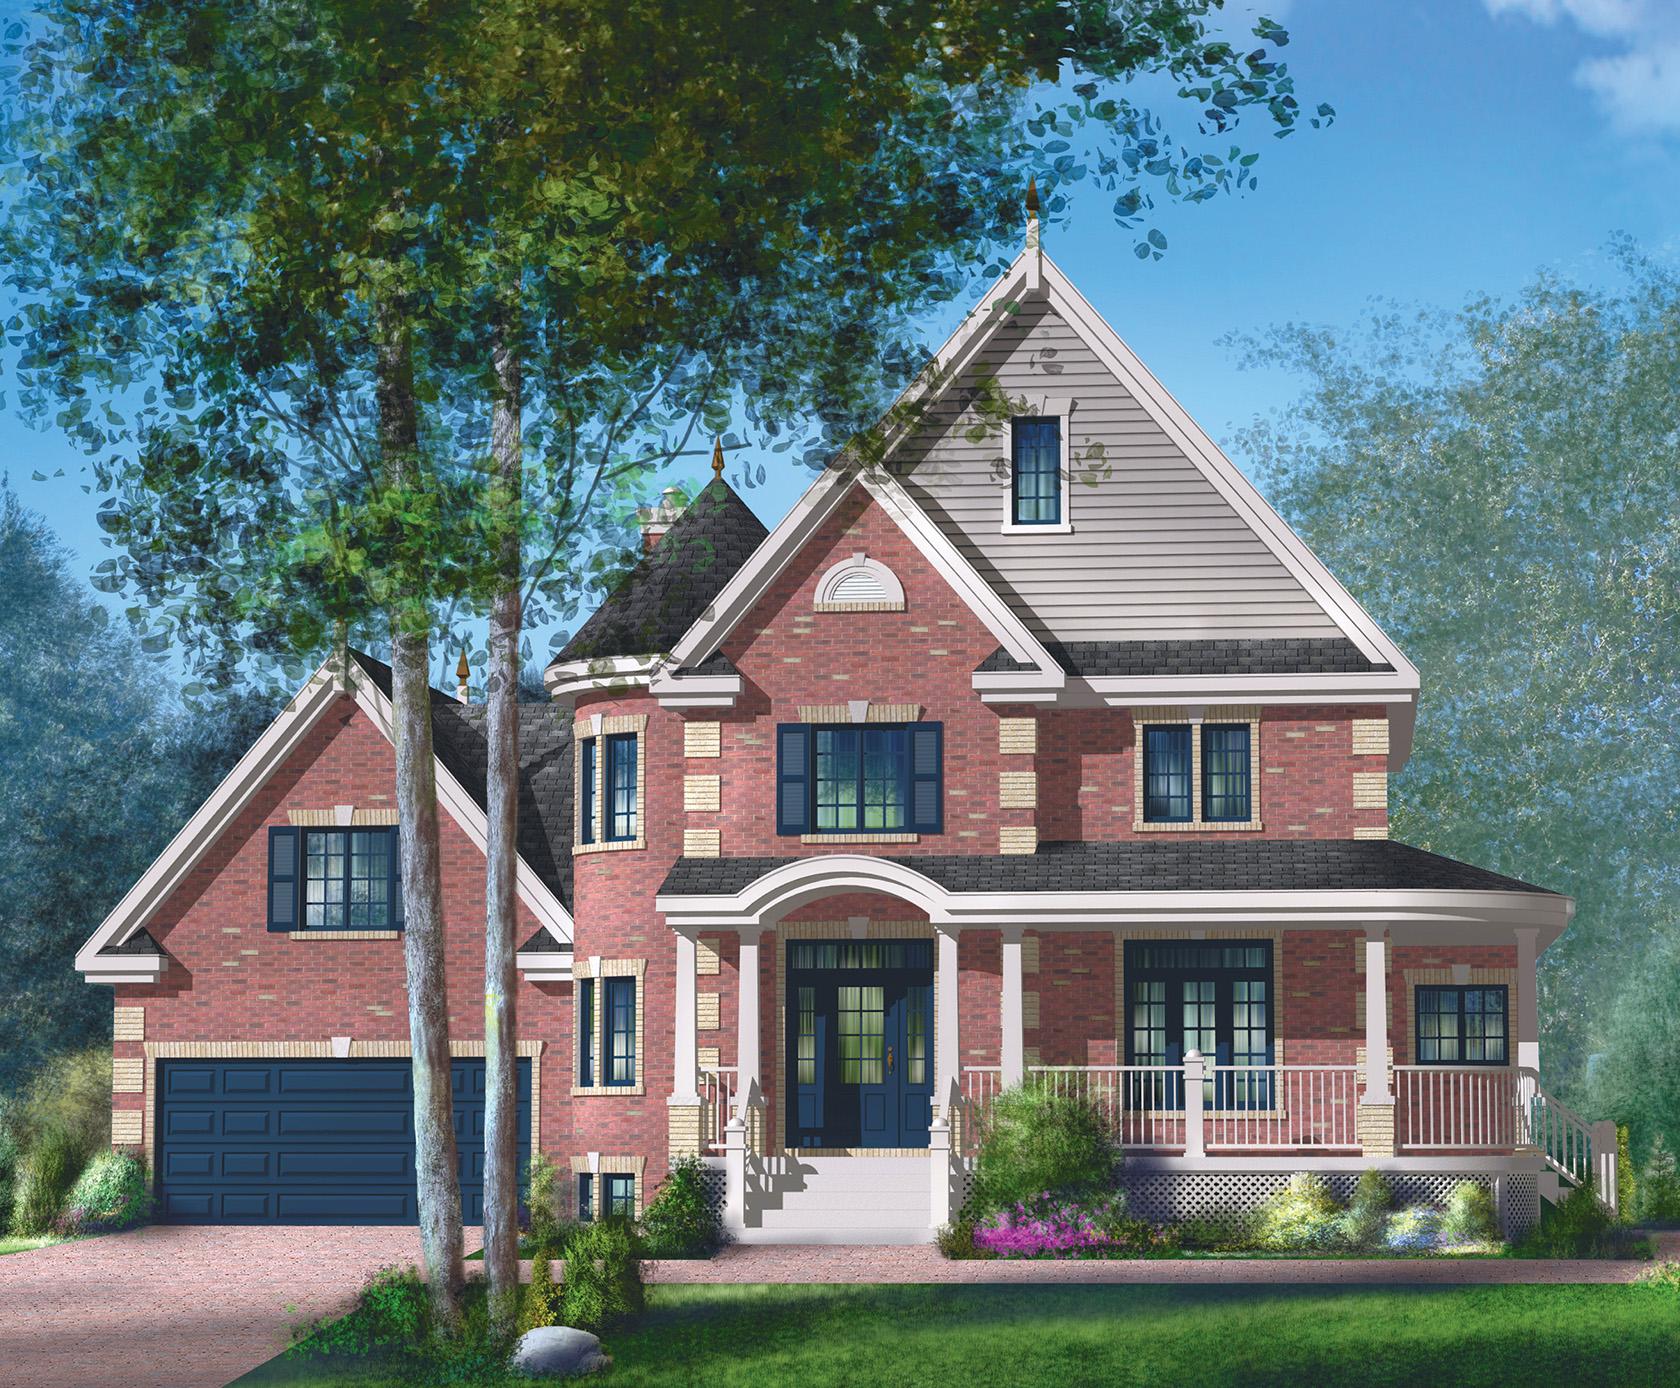 Brick Victorian House Plan - 80835pm Architectural